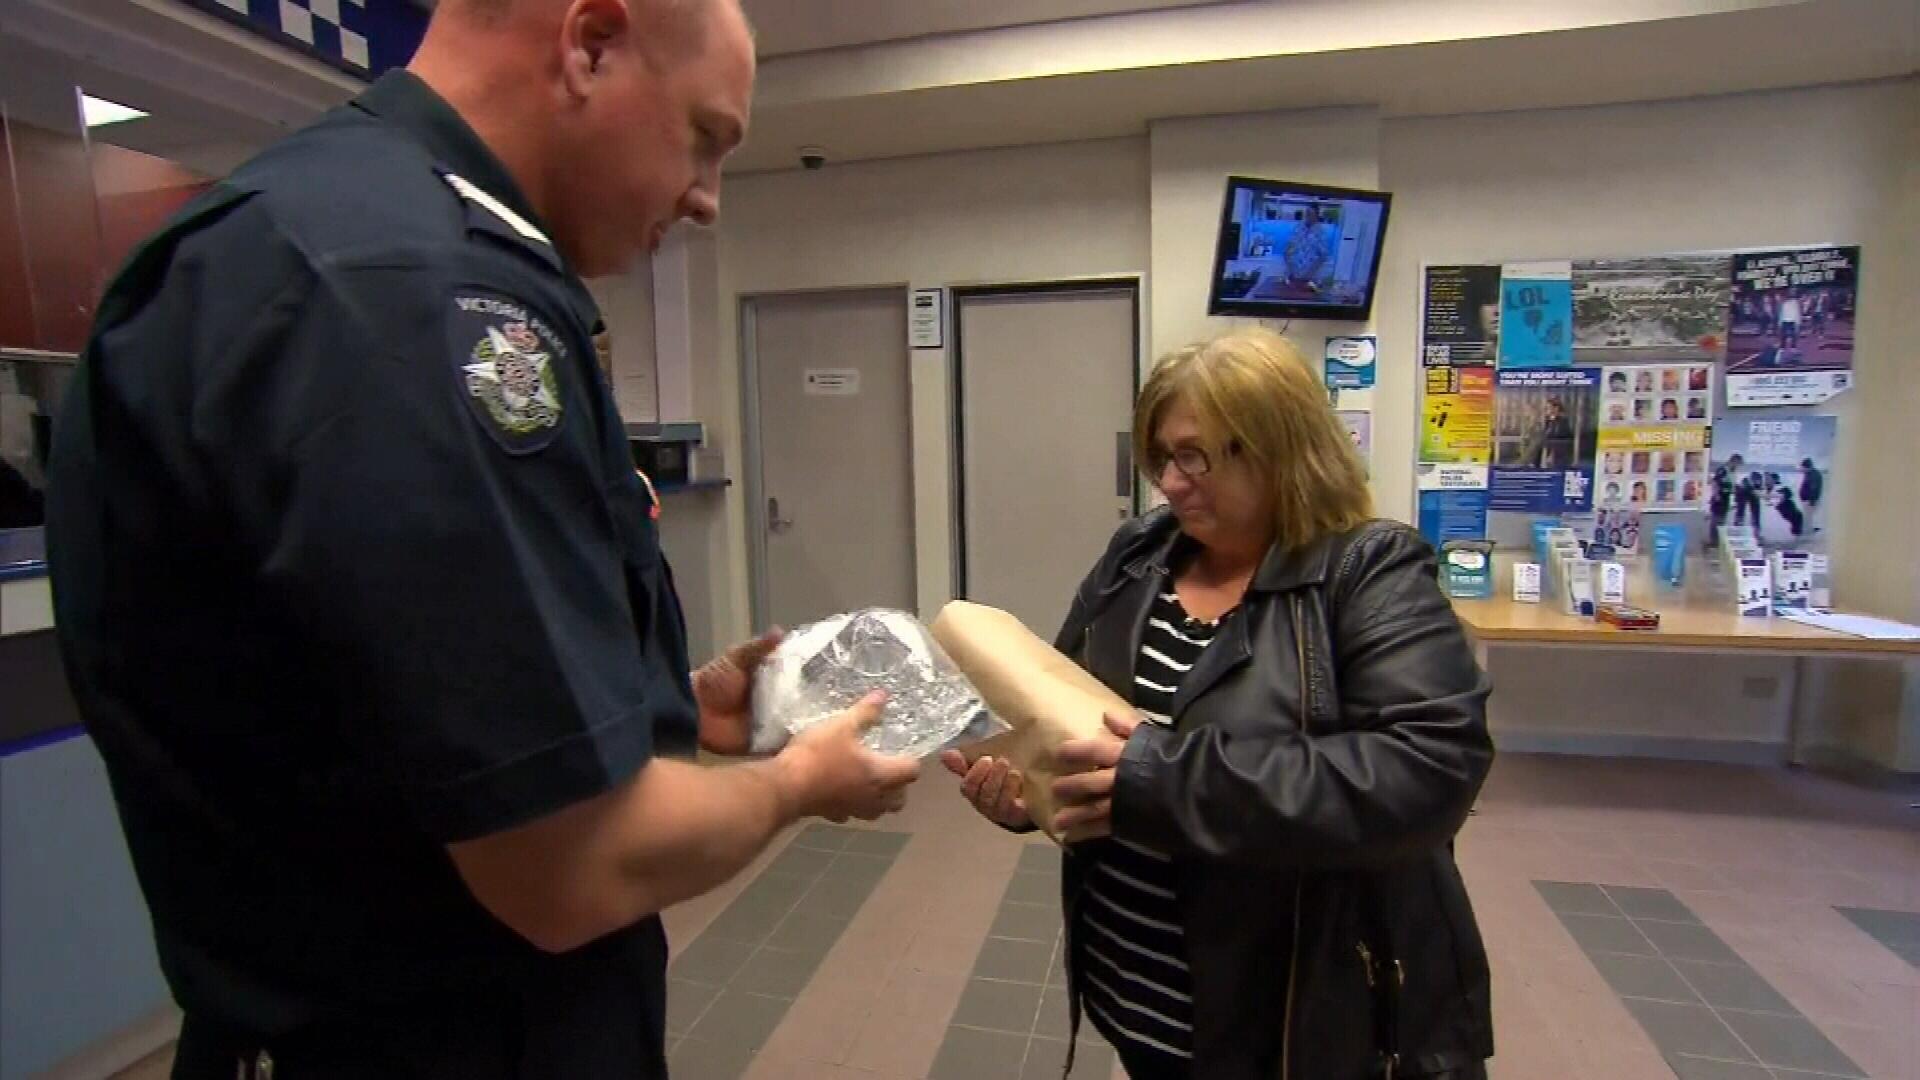 'Like losing him again': Son's ashes stolen in break-in